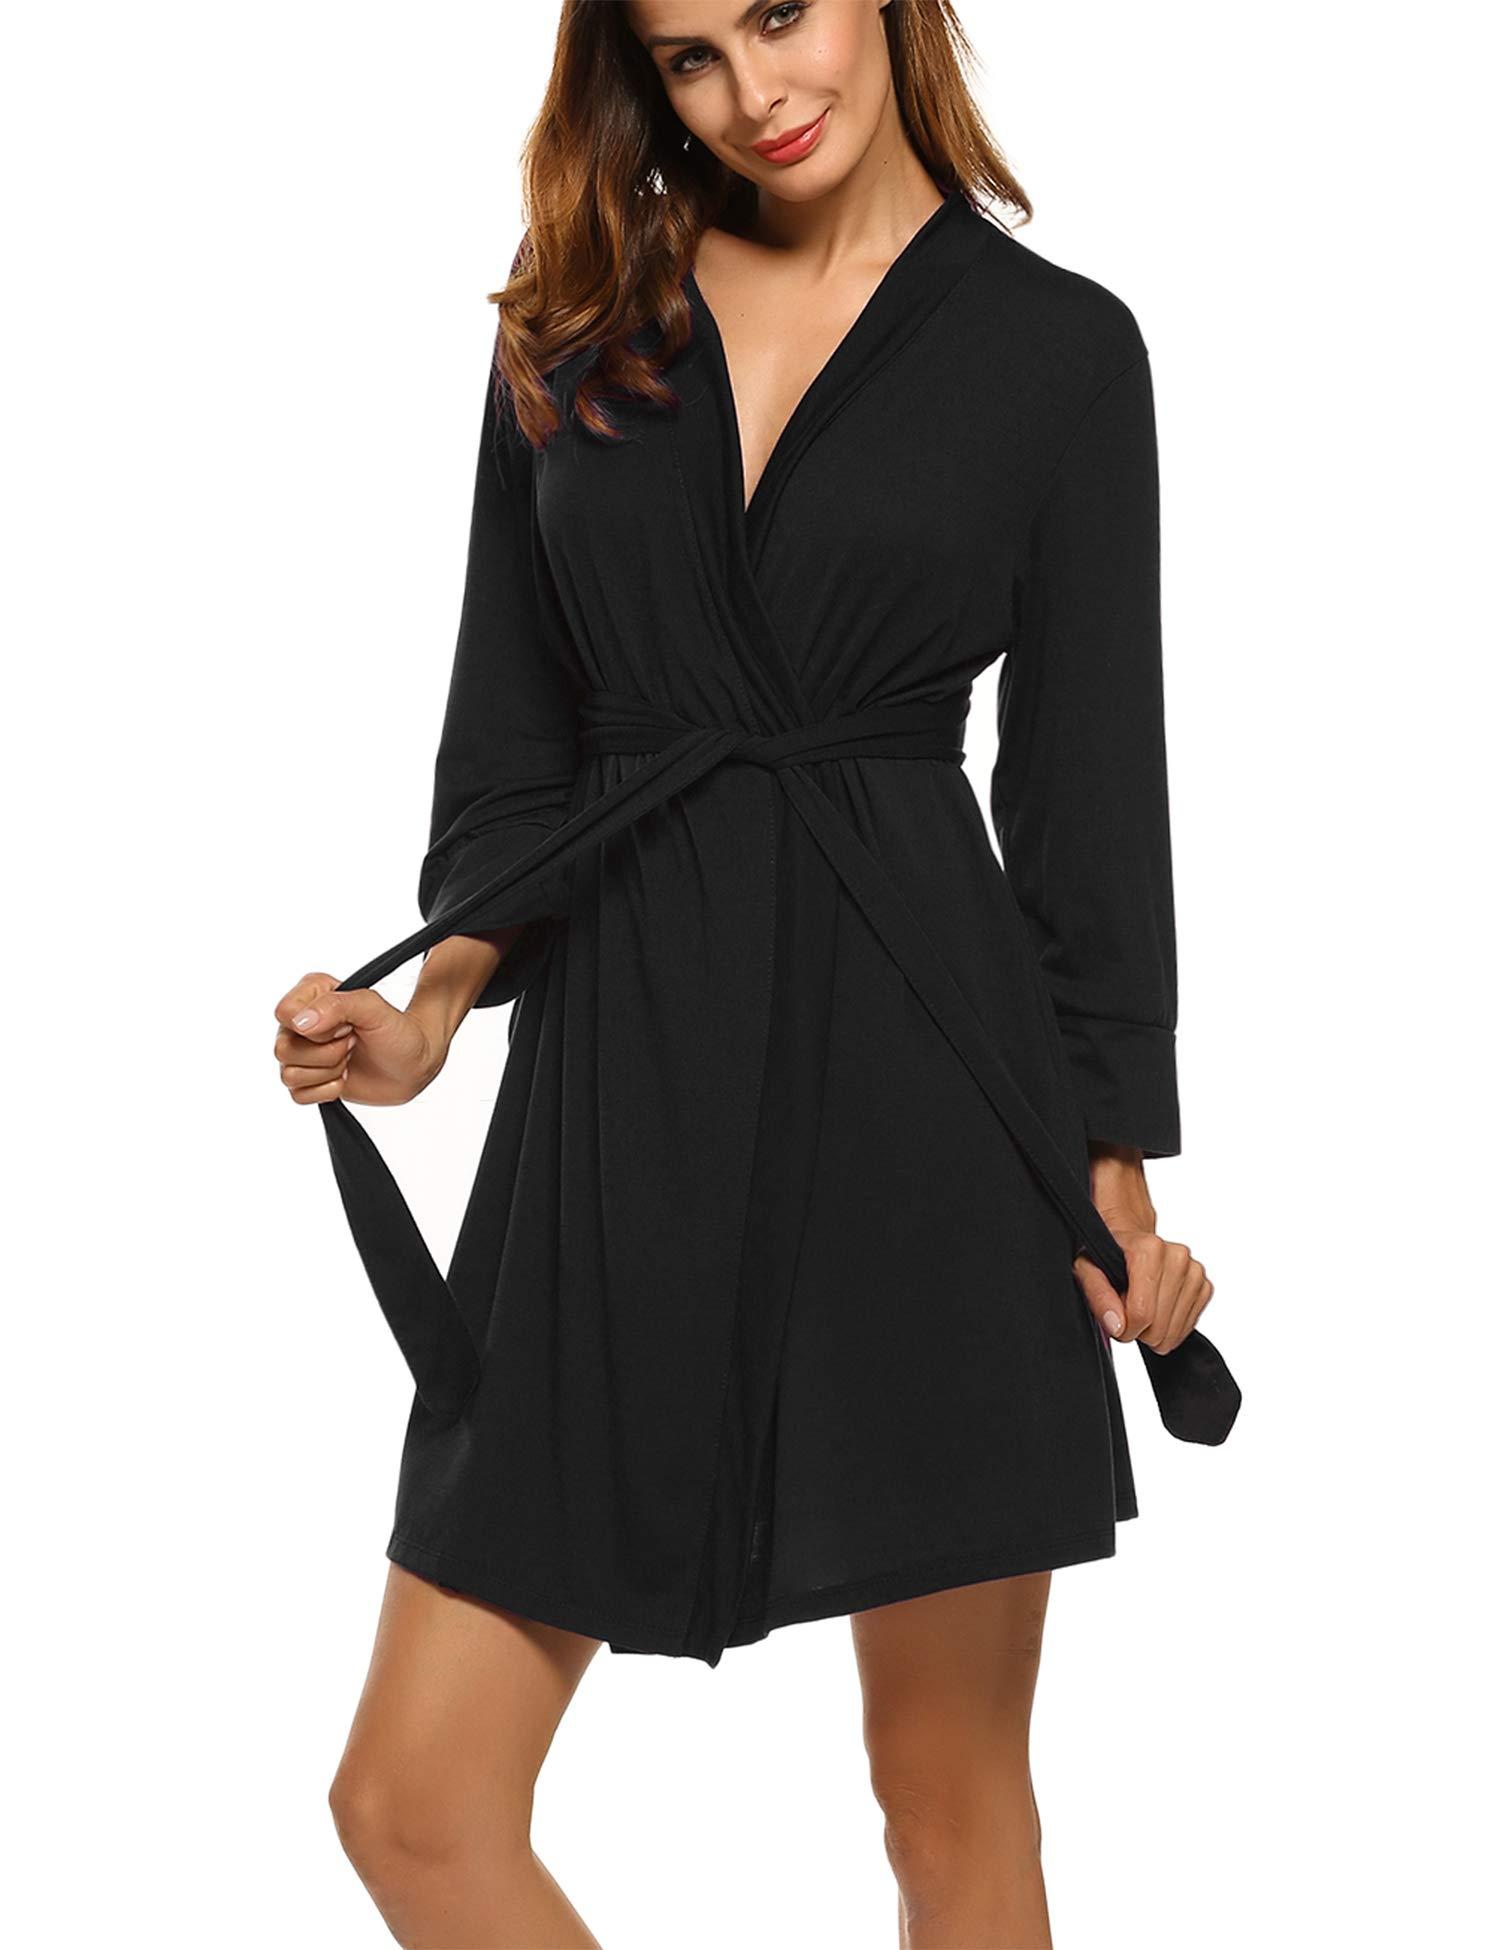 Hotouch Womens Bathrobe Soft Kimono Cotton Knit Robe Sleepwear Black S by Hotouch